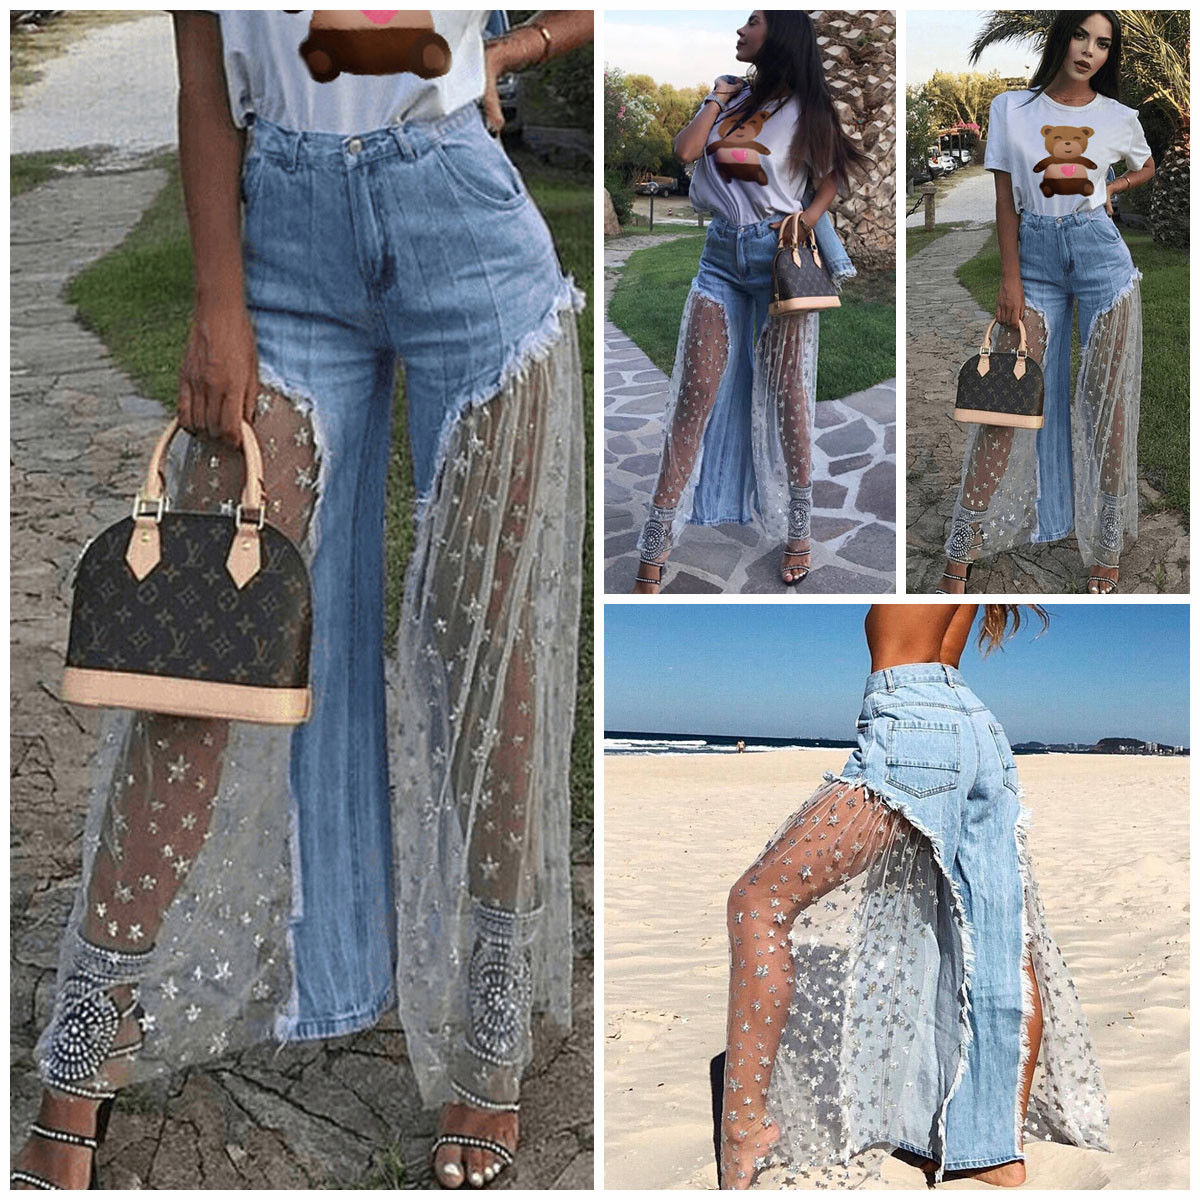 Hot Sale Women Denim Jeans Destroyed Split Joint Lace Tulle High Waist Wide Leg Pants Trousers Lace Up  Retro Bell Bottom